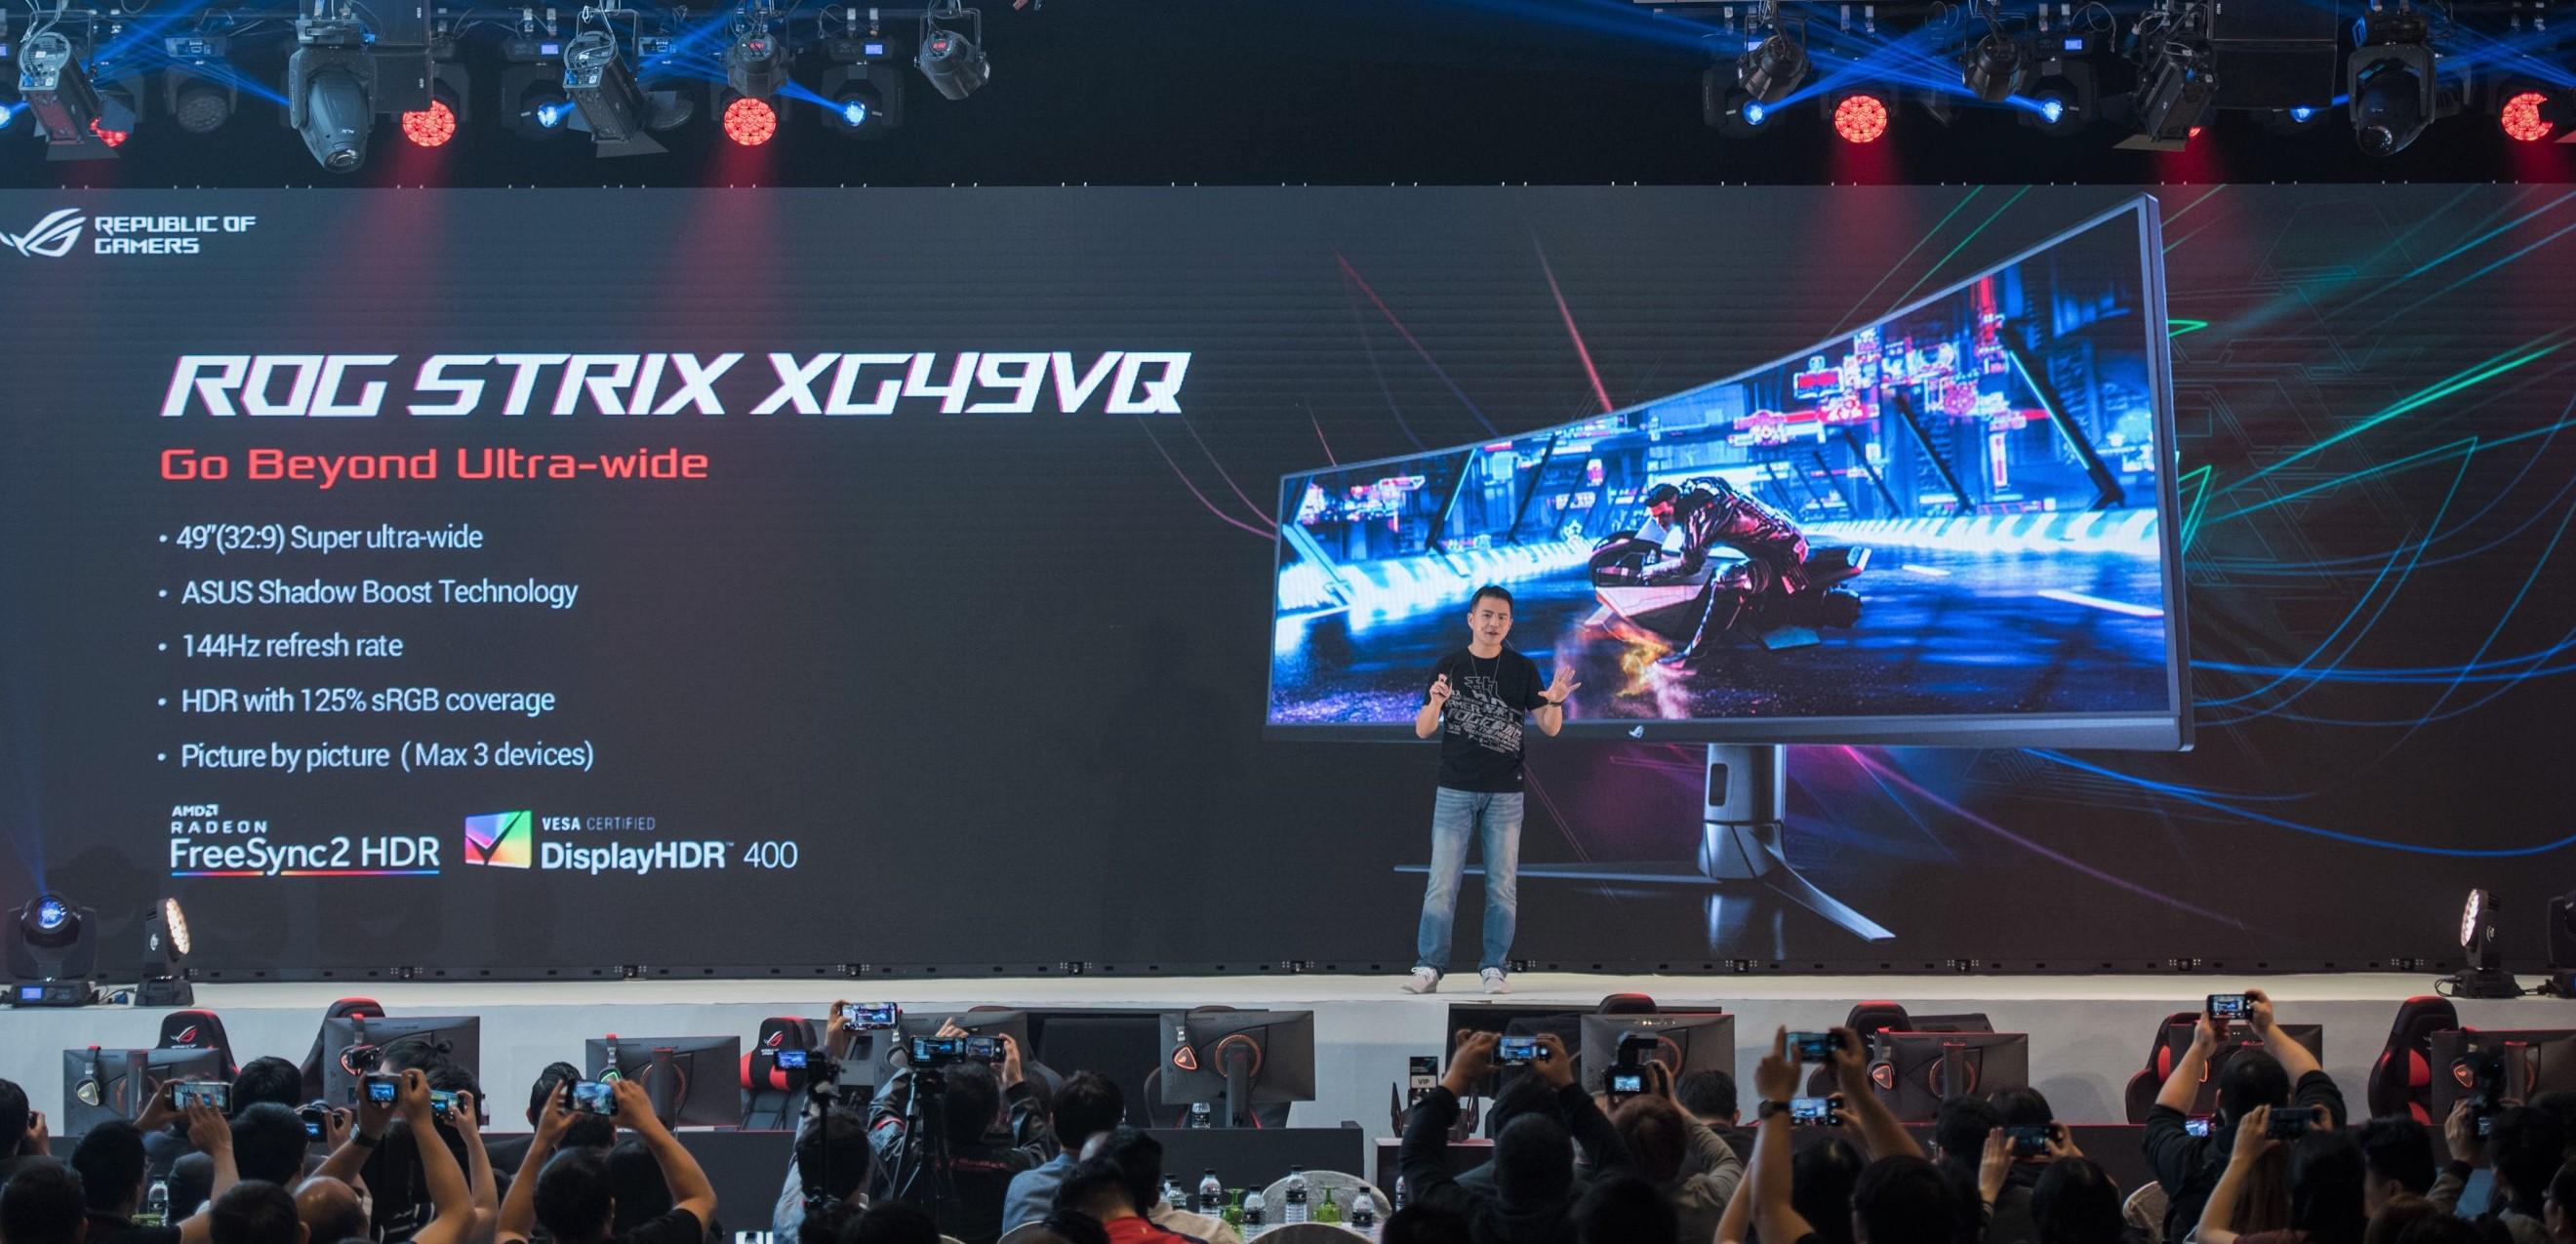 asus general manager of gaming gear and accessory business unit kris huang introduces rog strix xg49vq ASUS โชว์นวัตกรรมสินค้าสำหรับการใช้งานในองค์กรธุรกิจ บ้านและการเล่นเกม ที่งาน Incredible Intelligence 2018 ประเทศมาเลเซีย